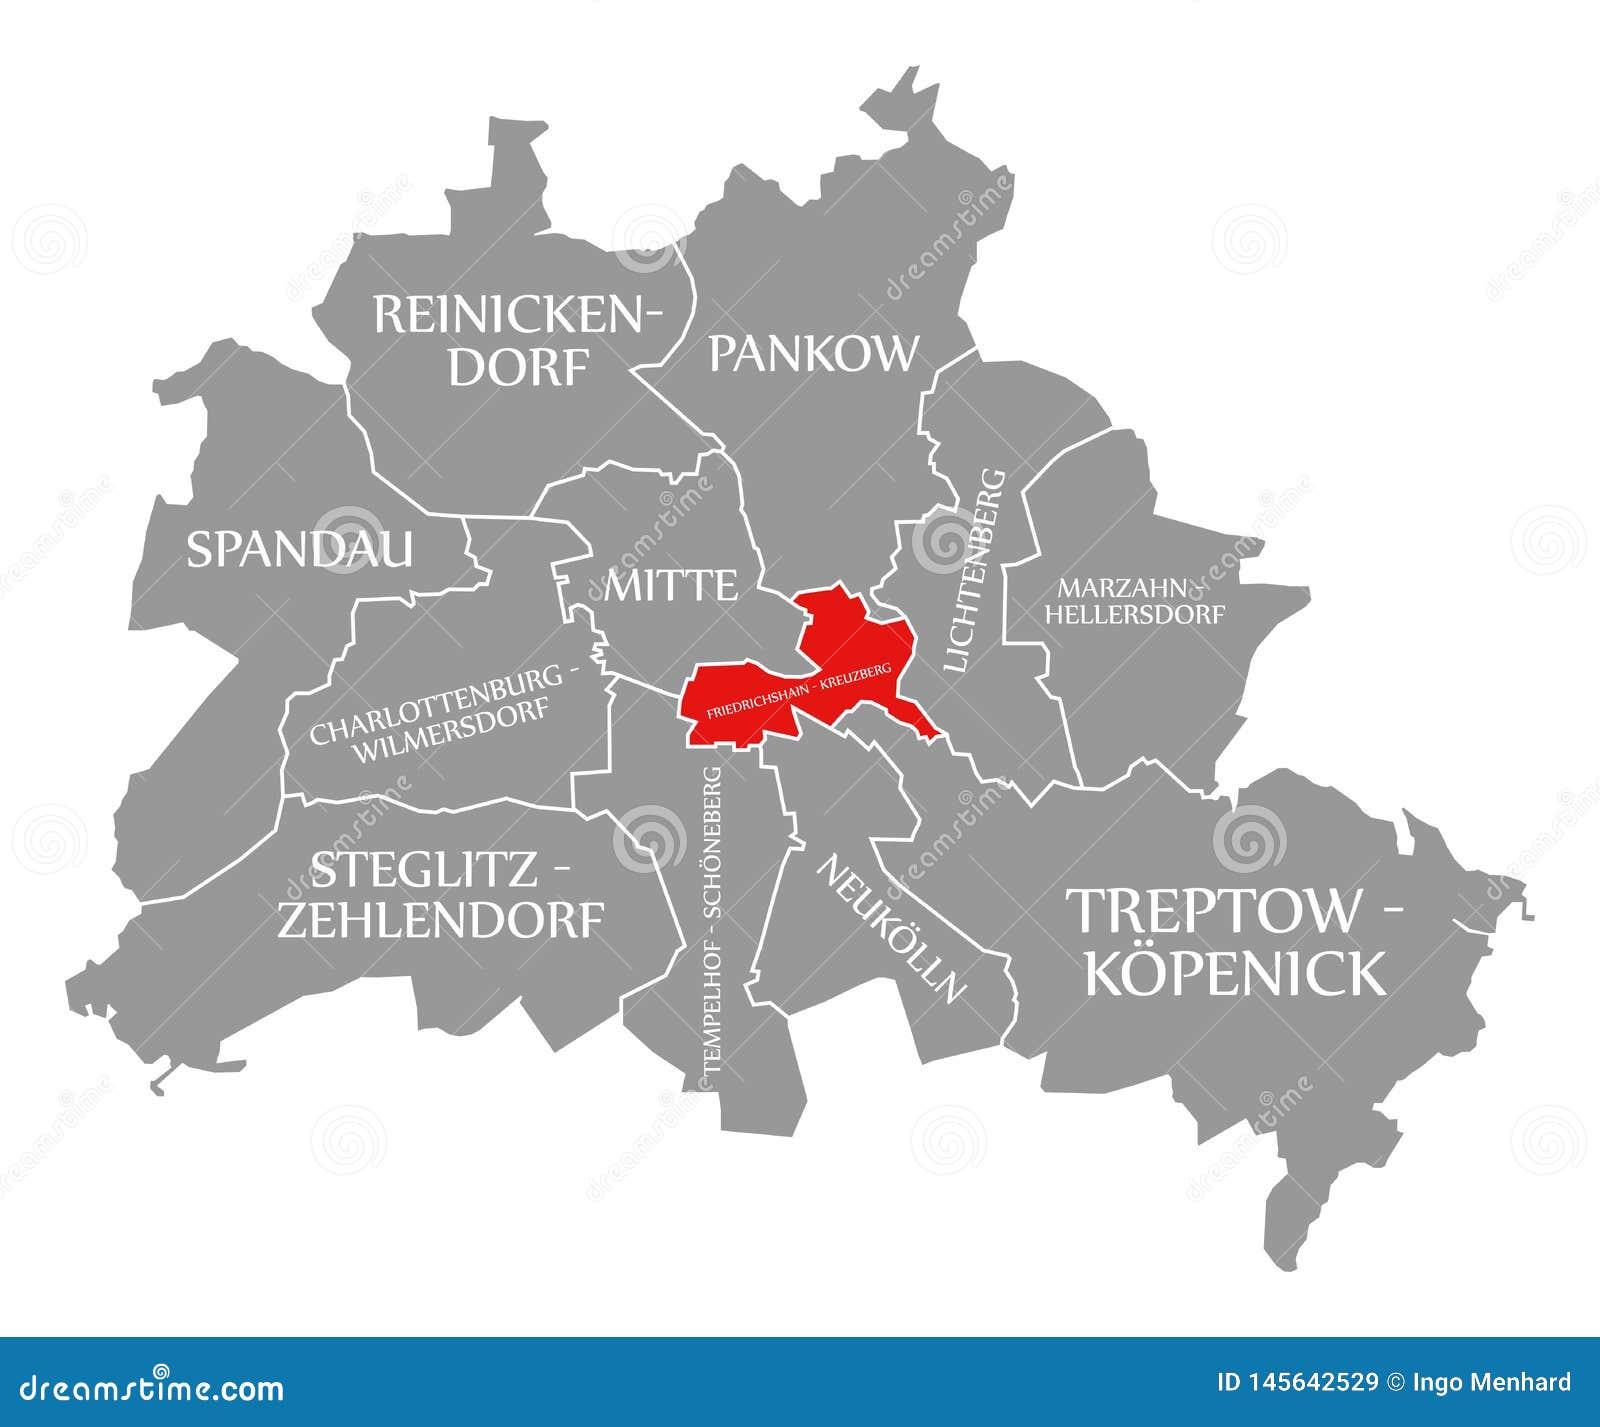 Friedrichshain-Kreuzberg City District Red Highlighted In ...